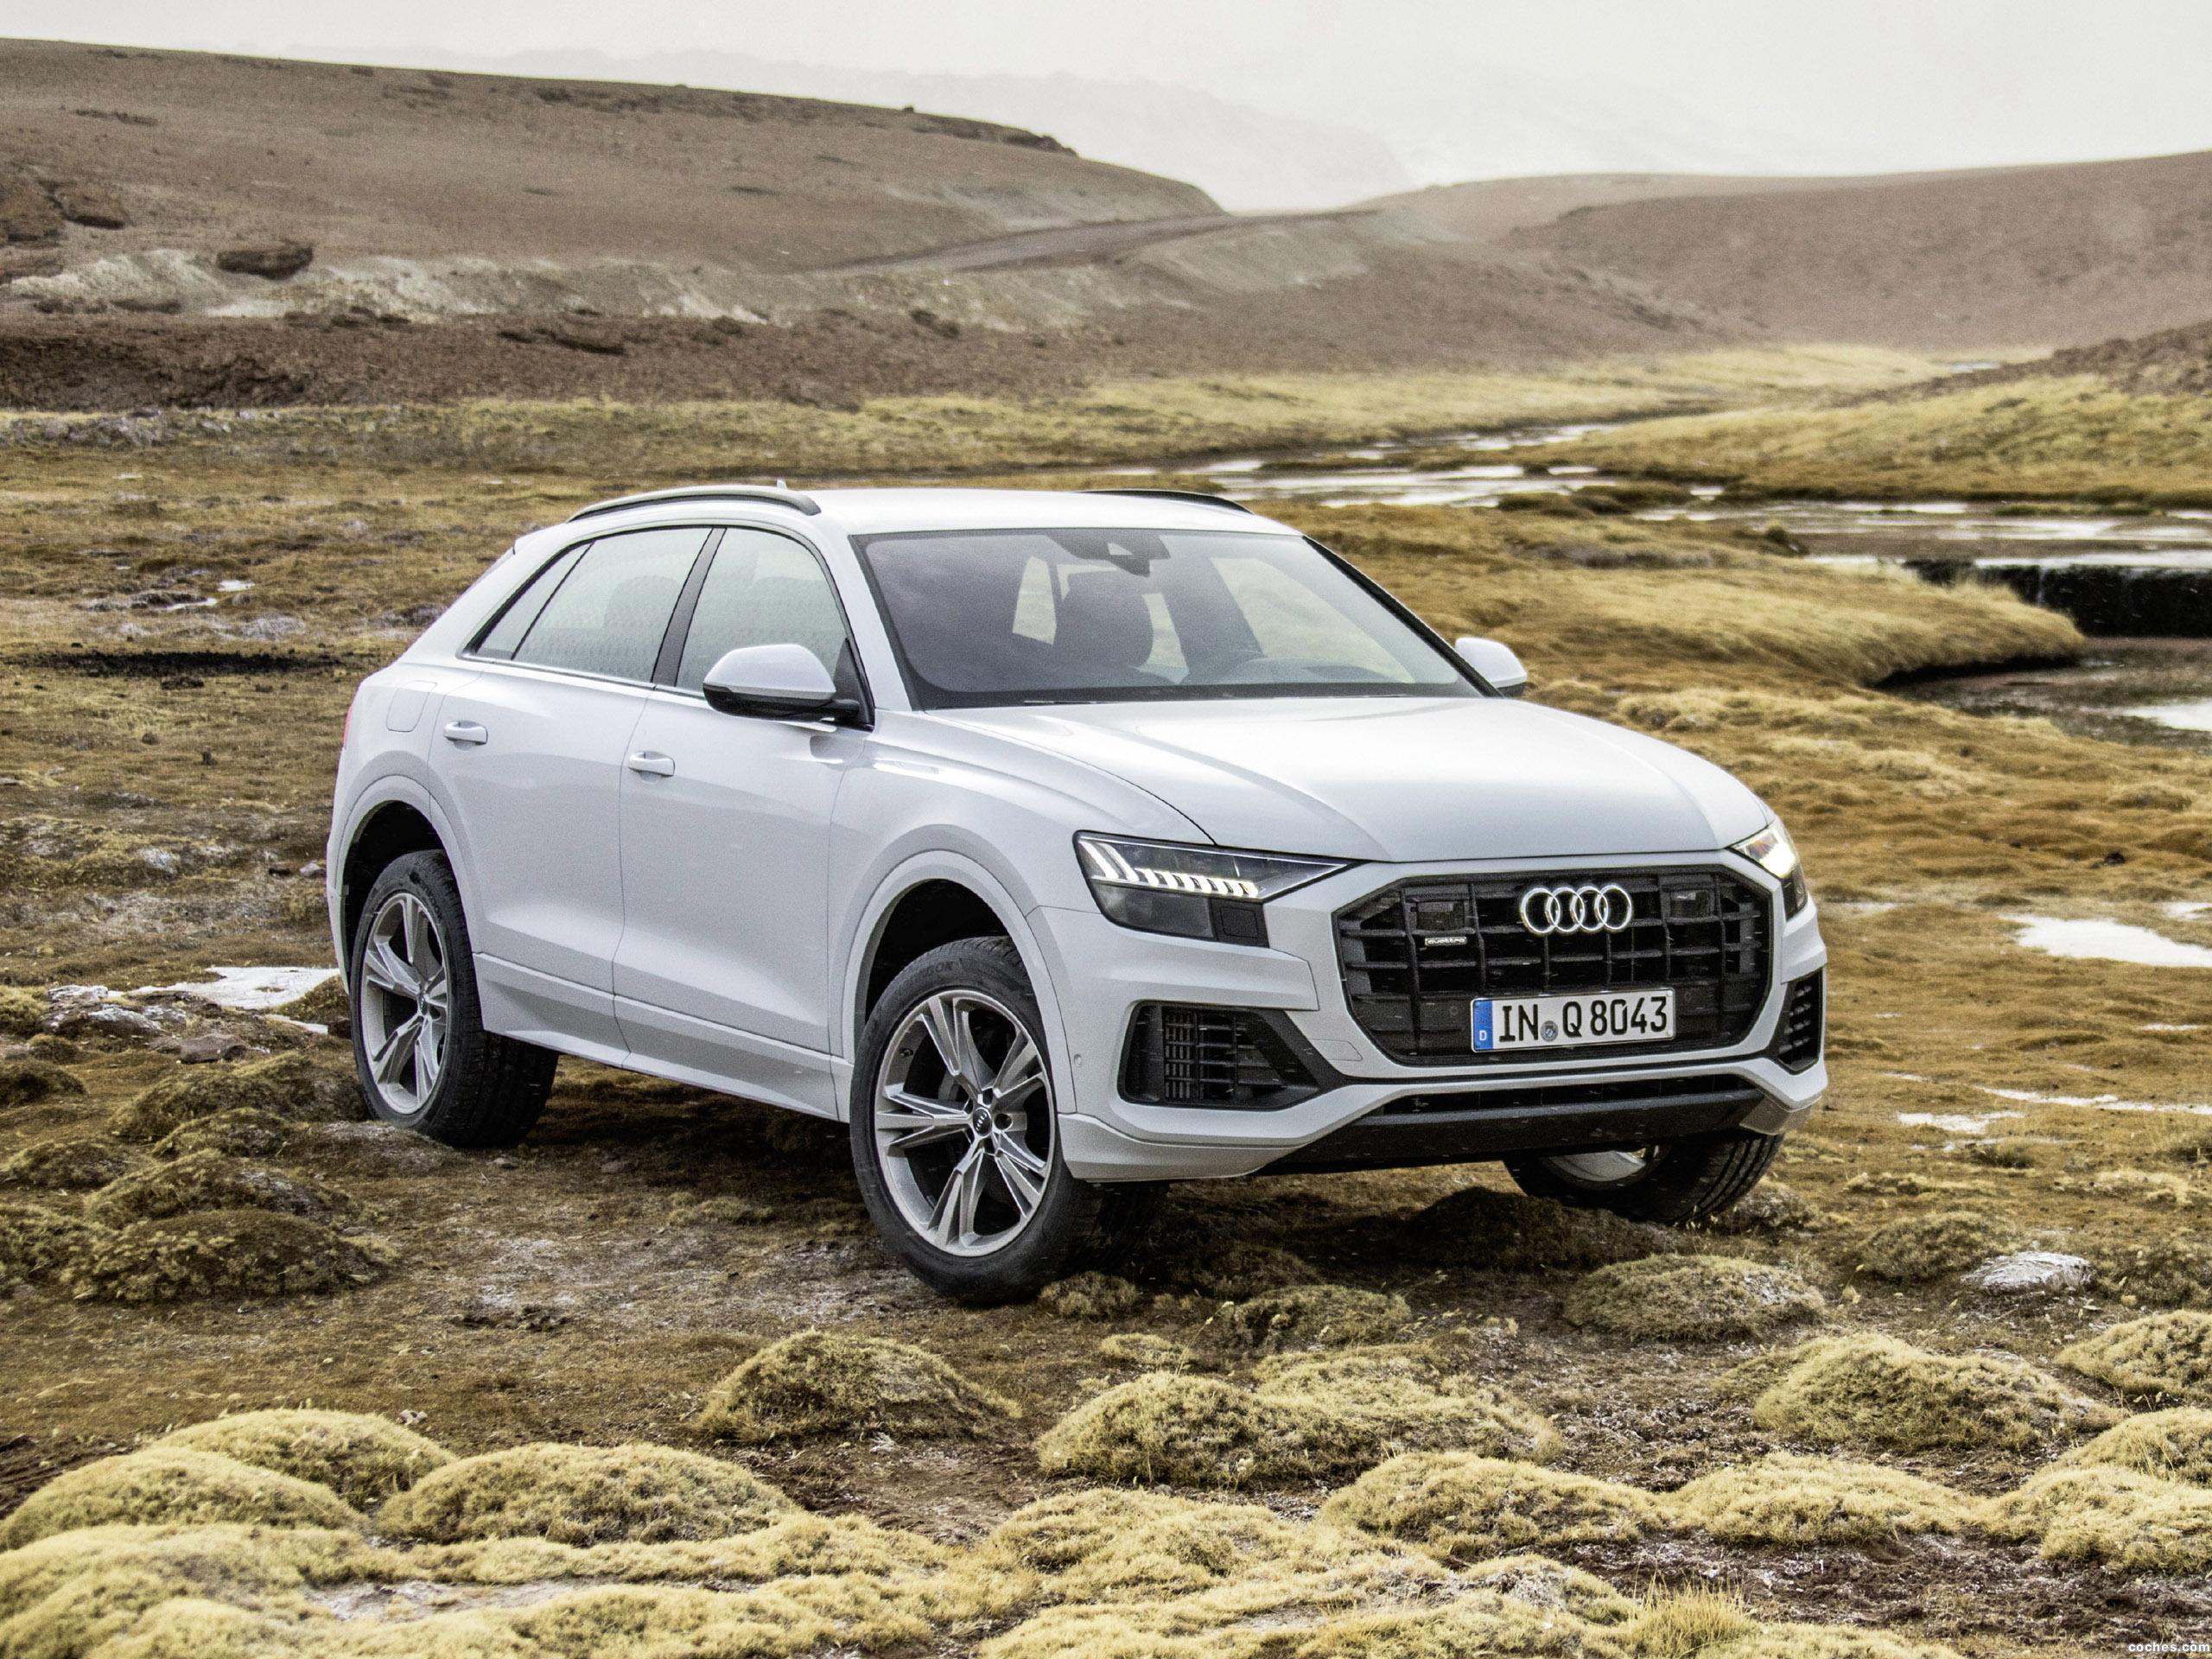 Foto 0 de Audi Q8 55 TFSI Quattro 2018